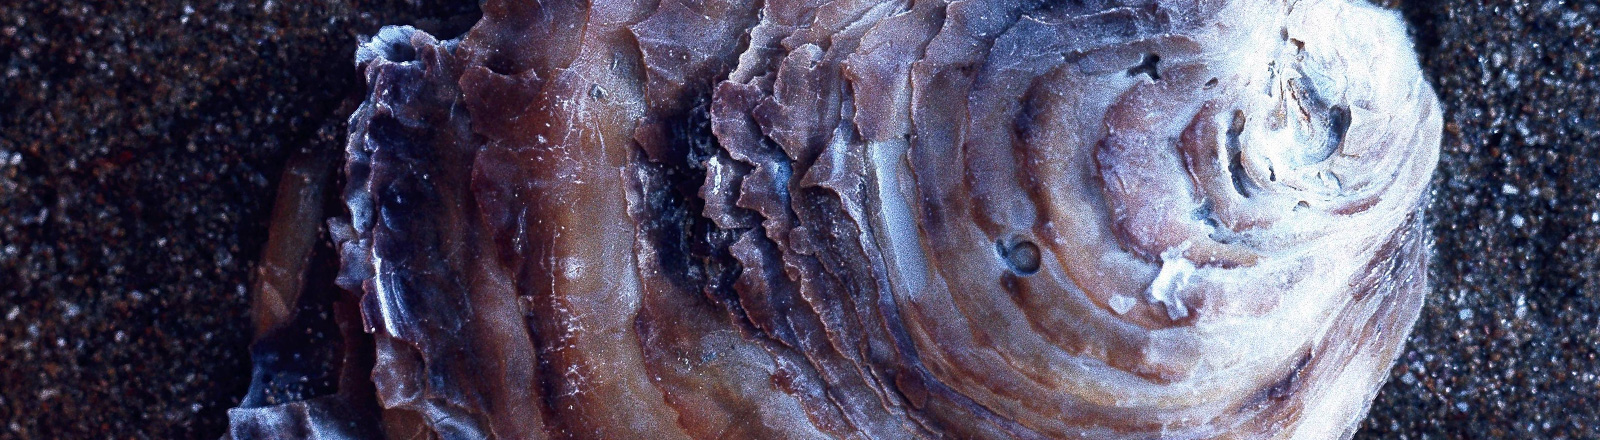 Europäische Auster (Ostrea edulis)